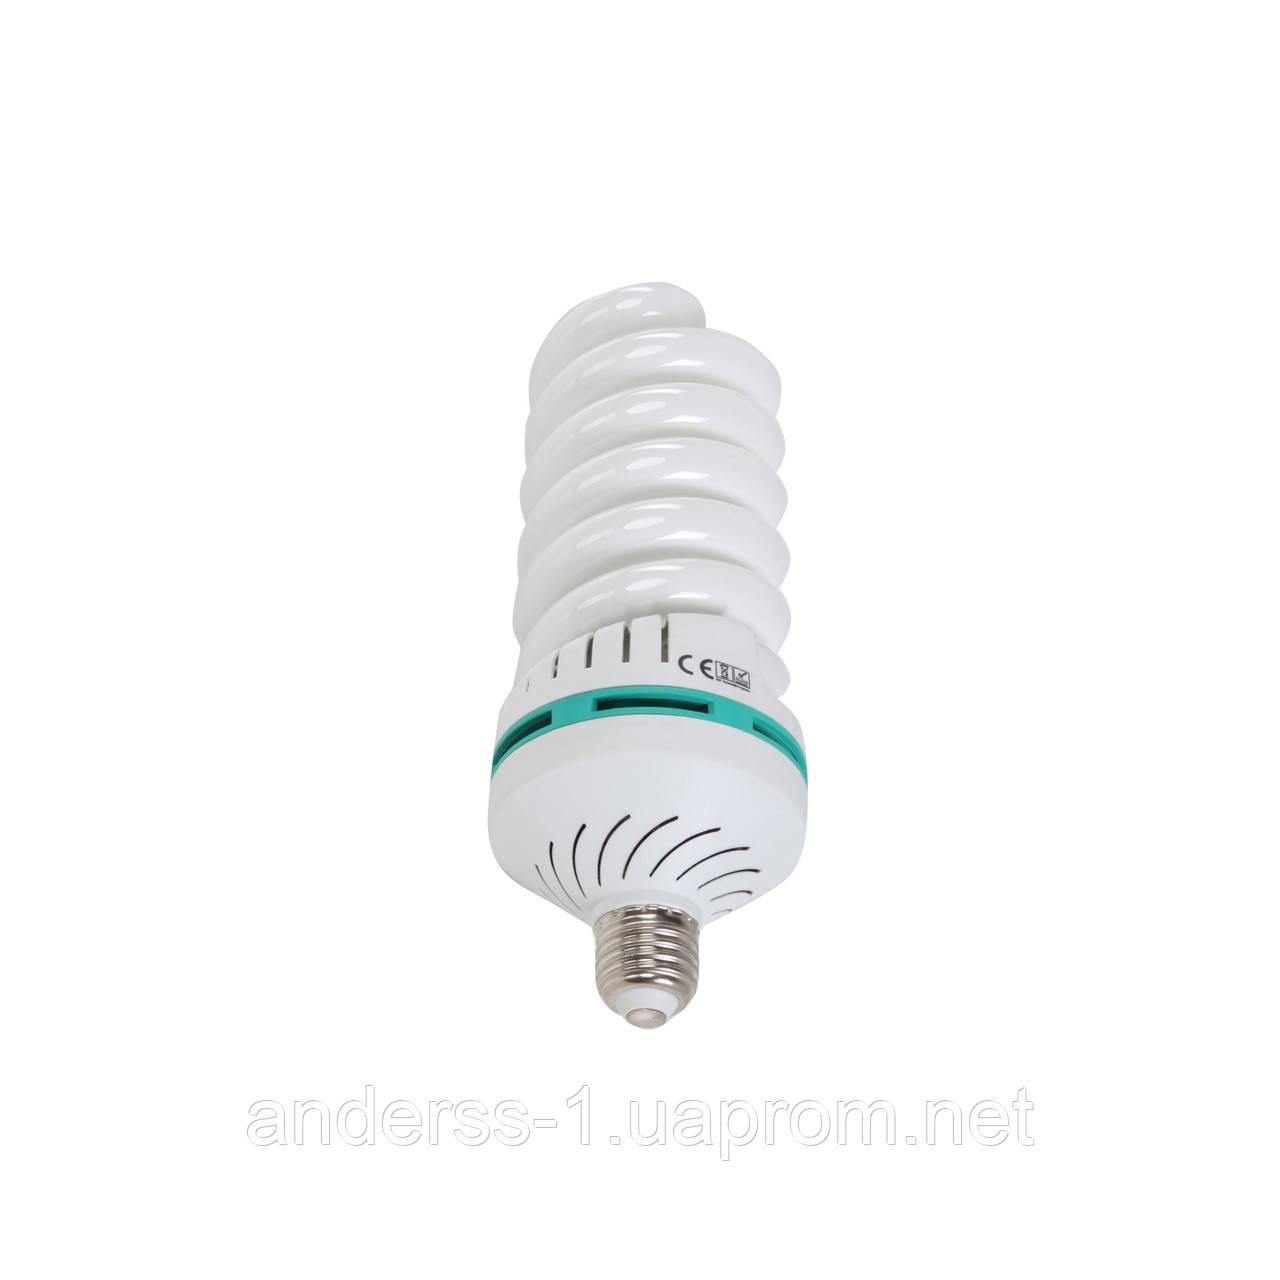 Энергосберегающая лампа 80W